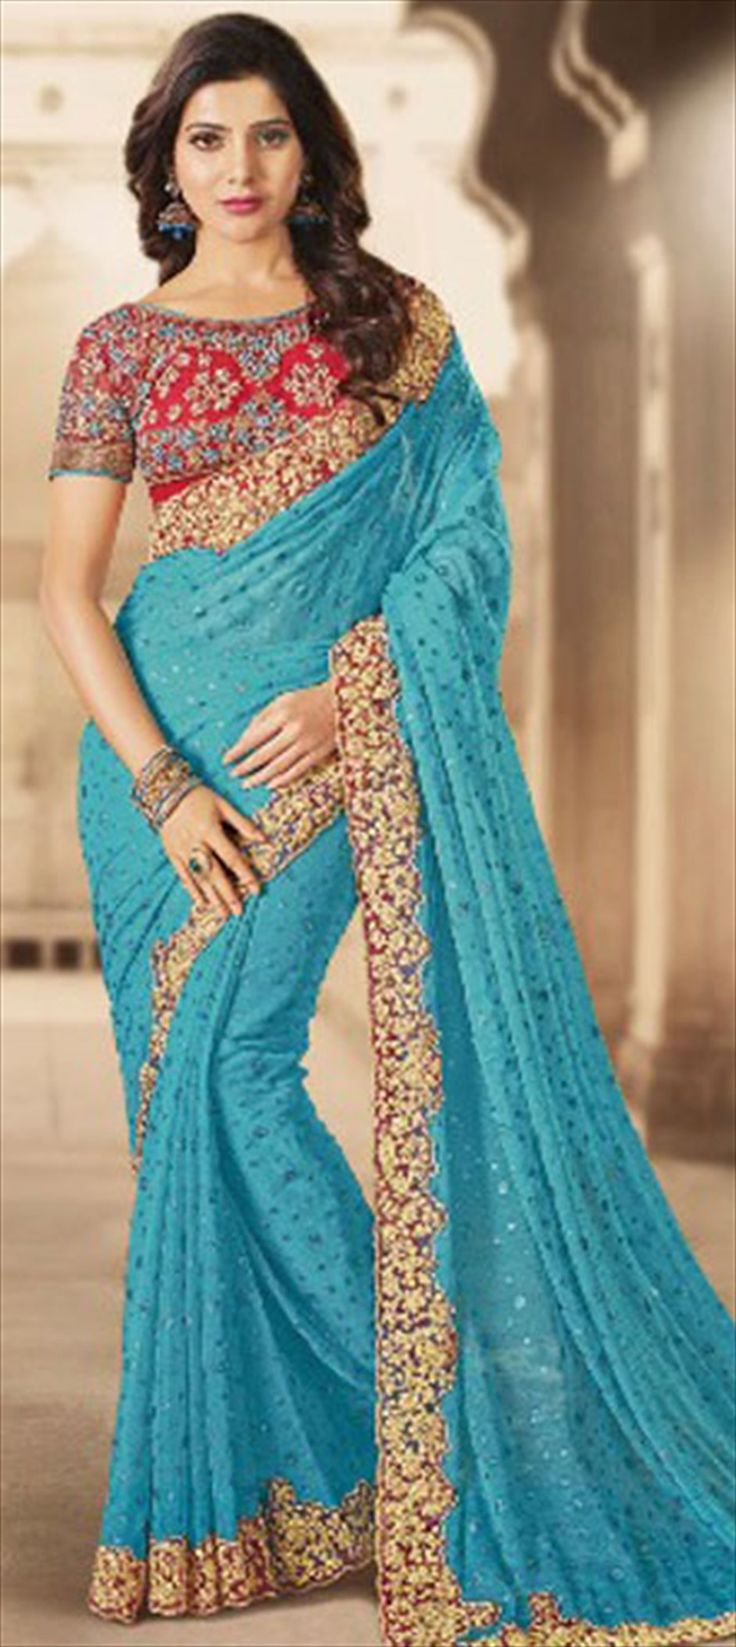 766 best Celebrities Fashion images on Pinterest | Indian wear ...